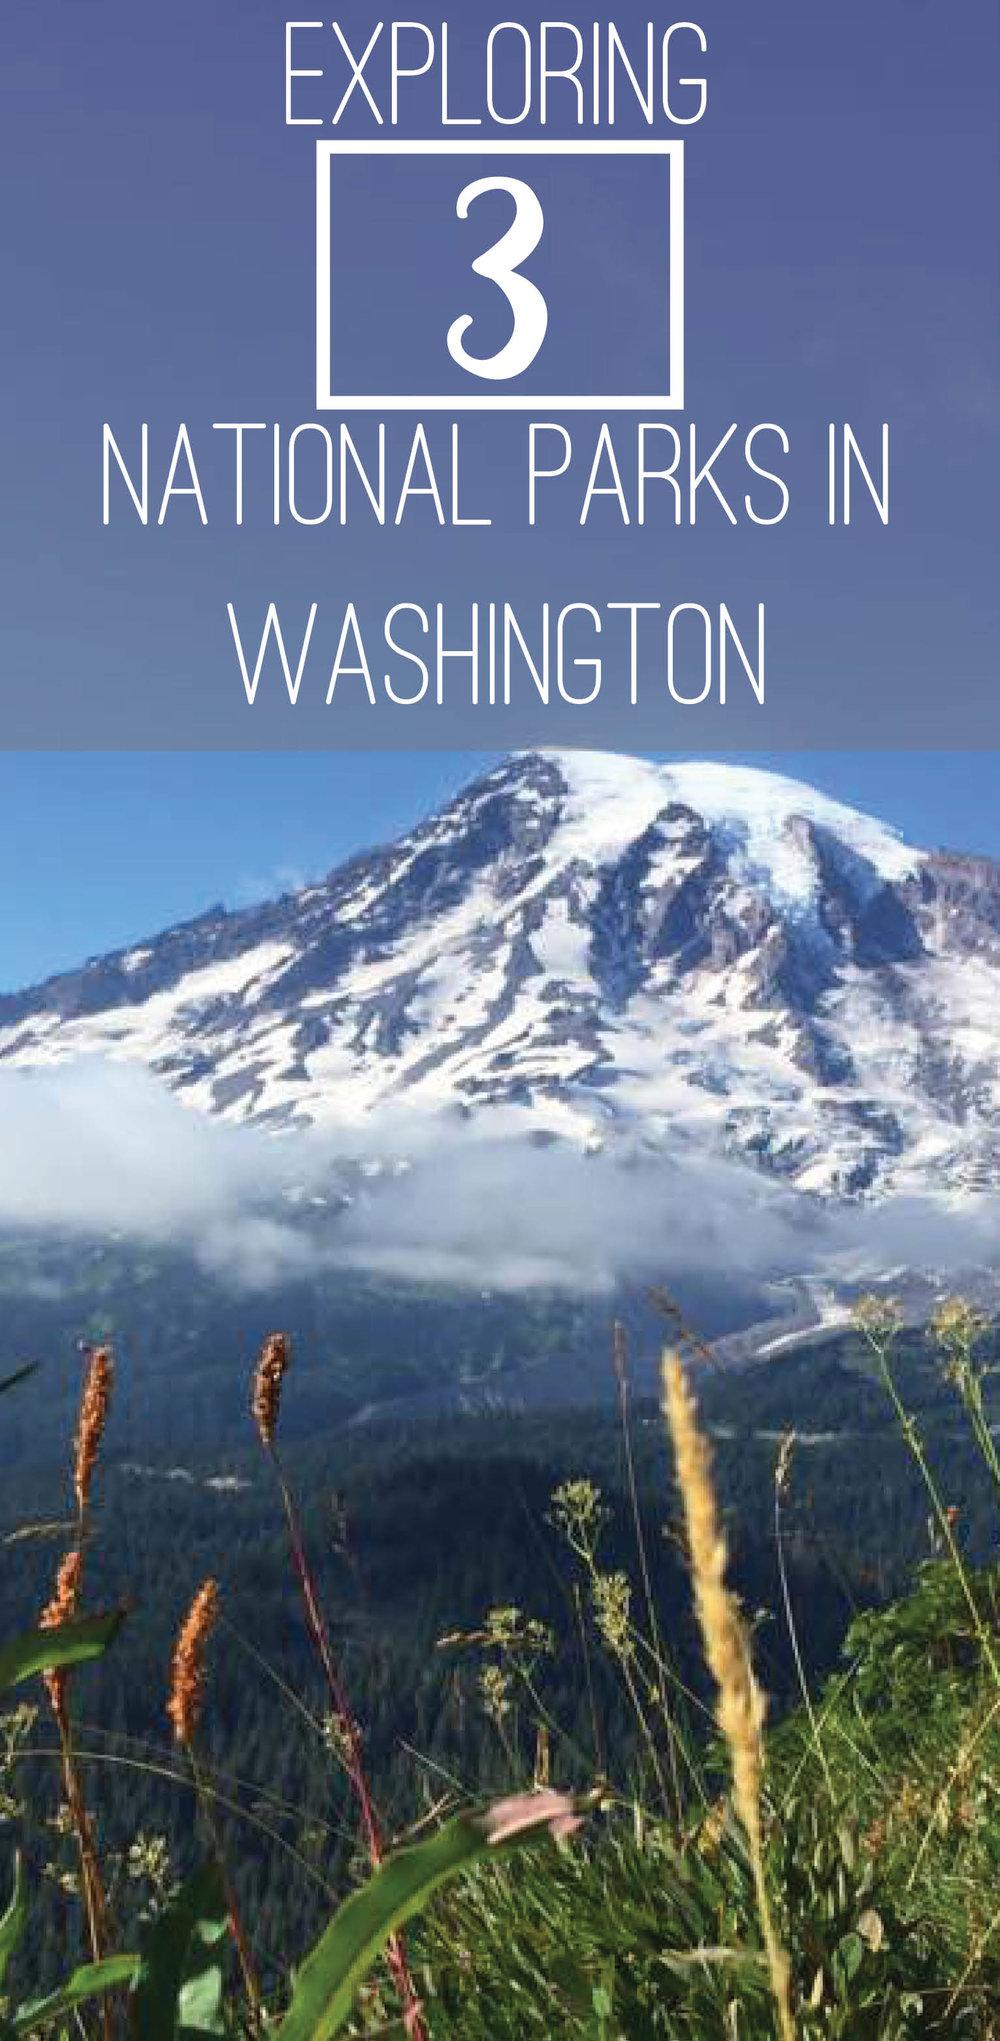 3 National Parks in Washington.jpg